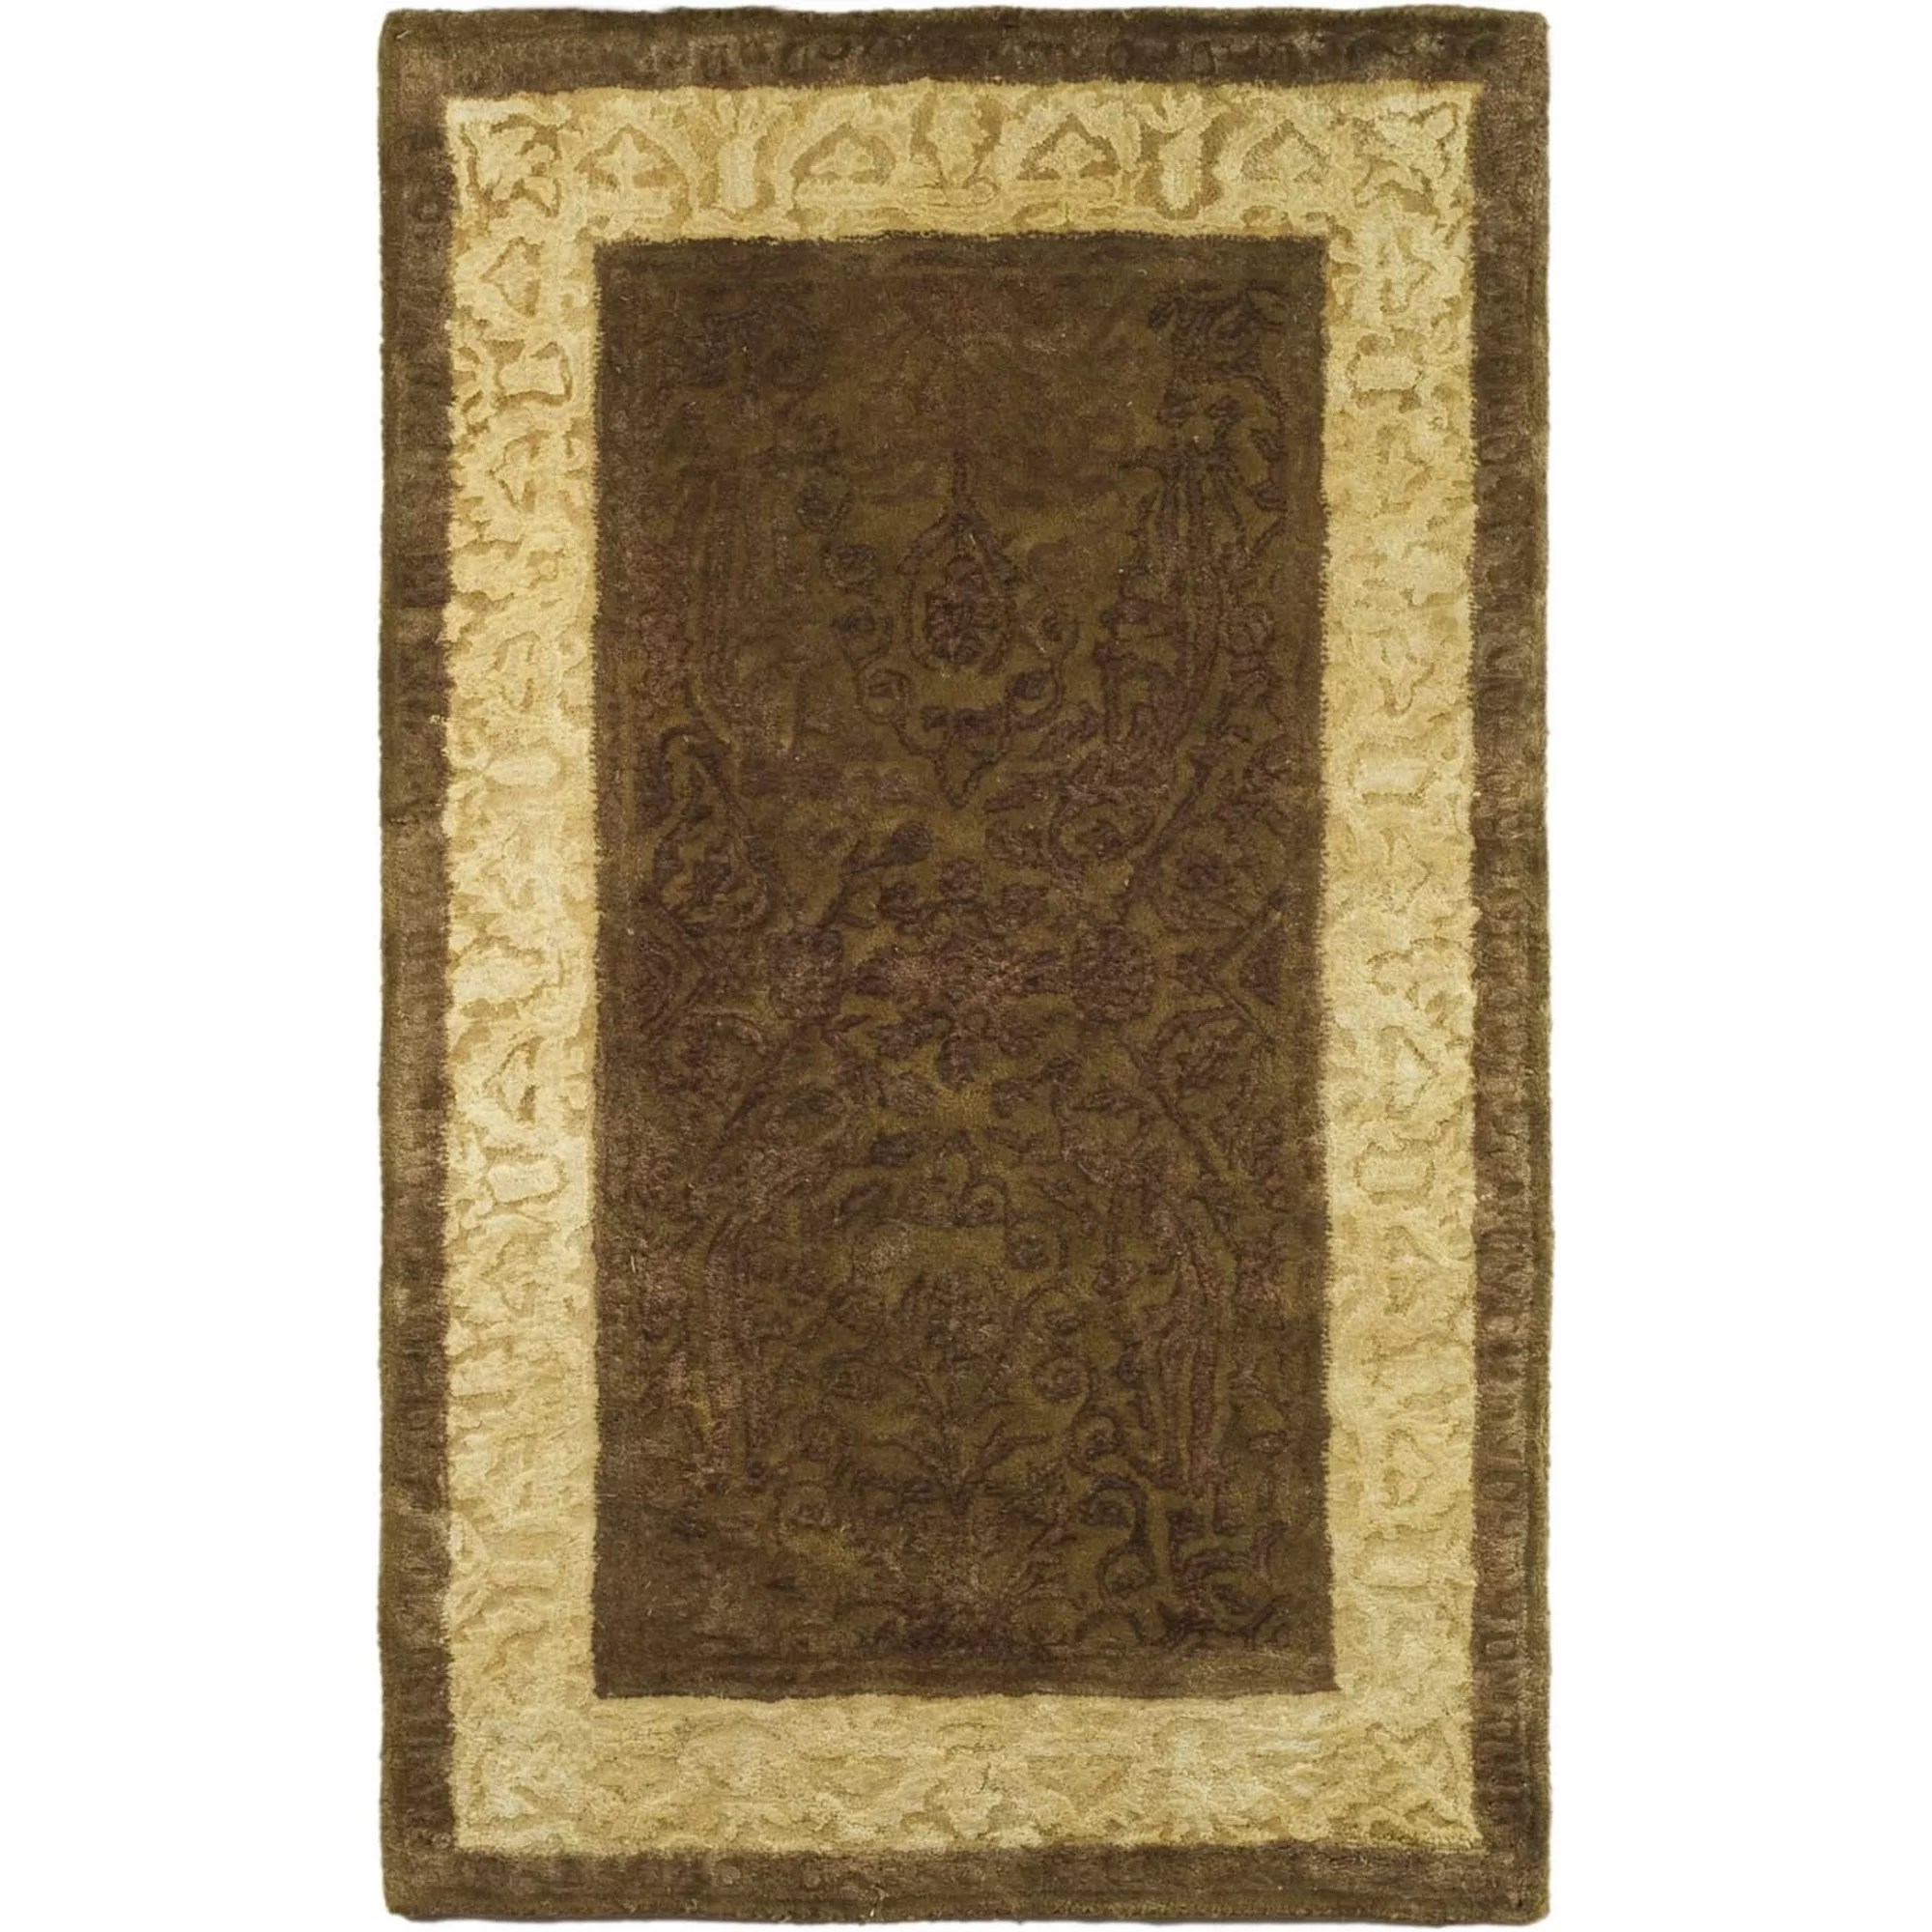 Safavieh Silk Road ChocolateLight Gold Area Rug  Reviews  Wayfair